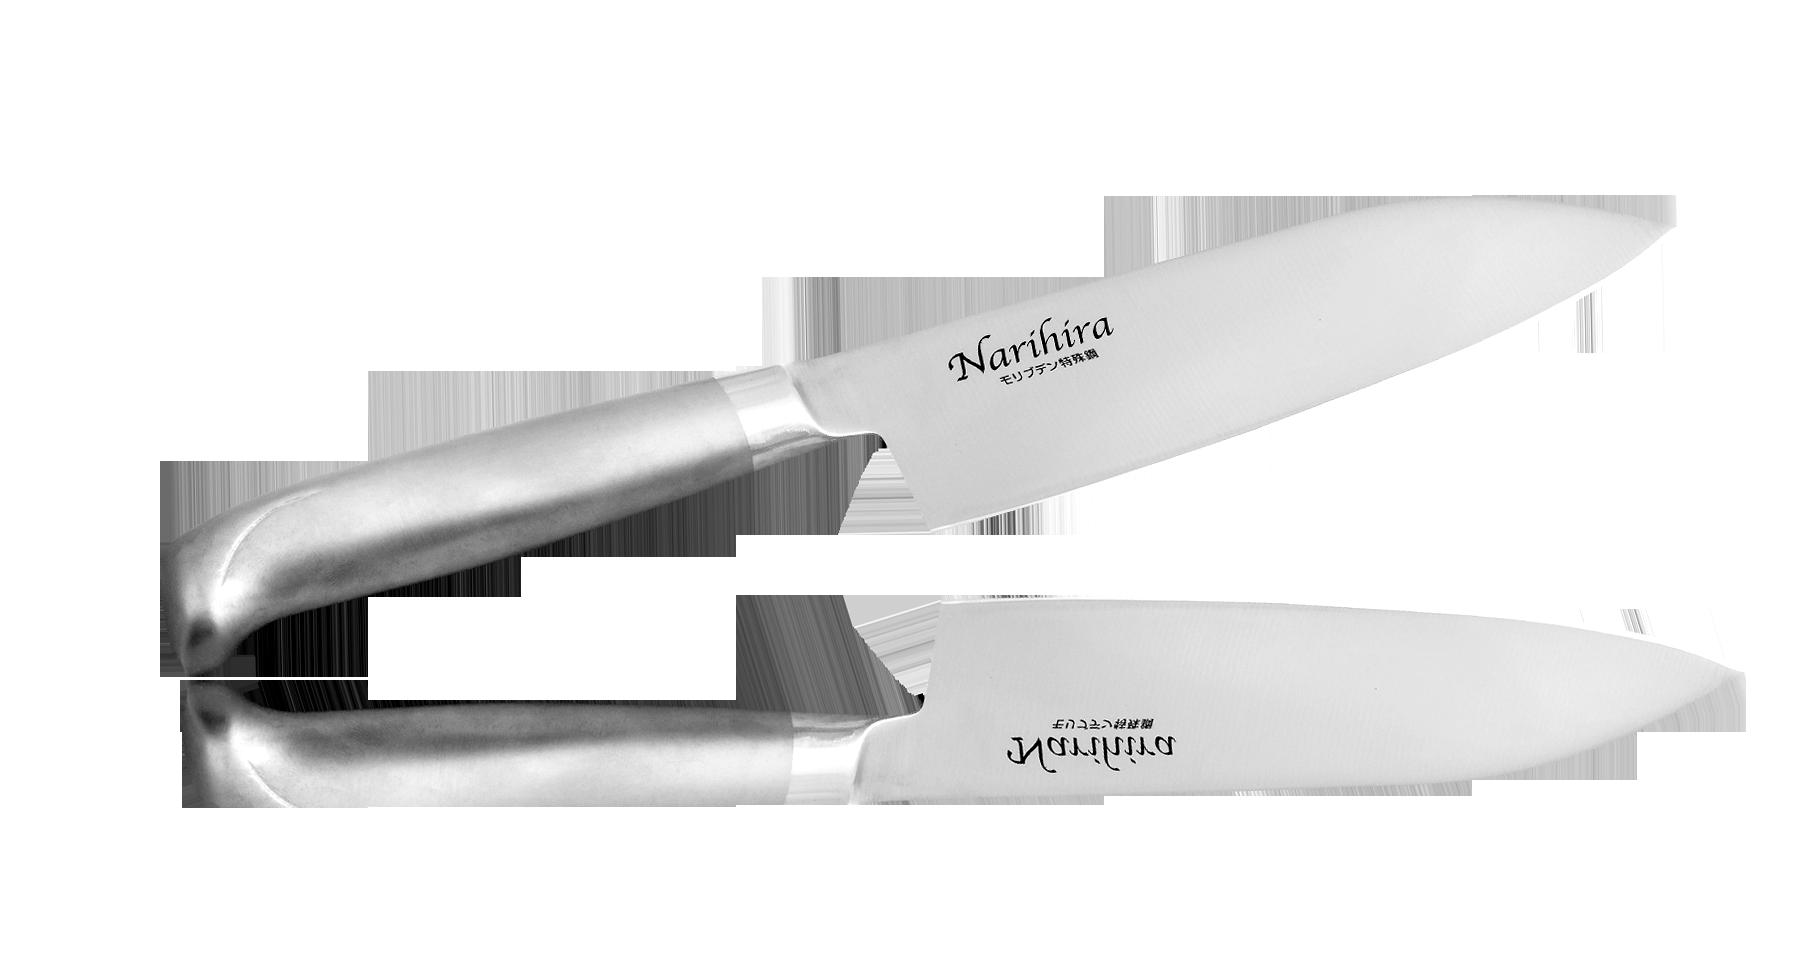 Нож Сантоку Narihira Fuji Cutlery, FC-61, сталь Mo-V, серый